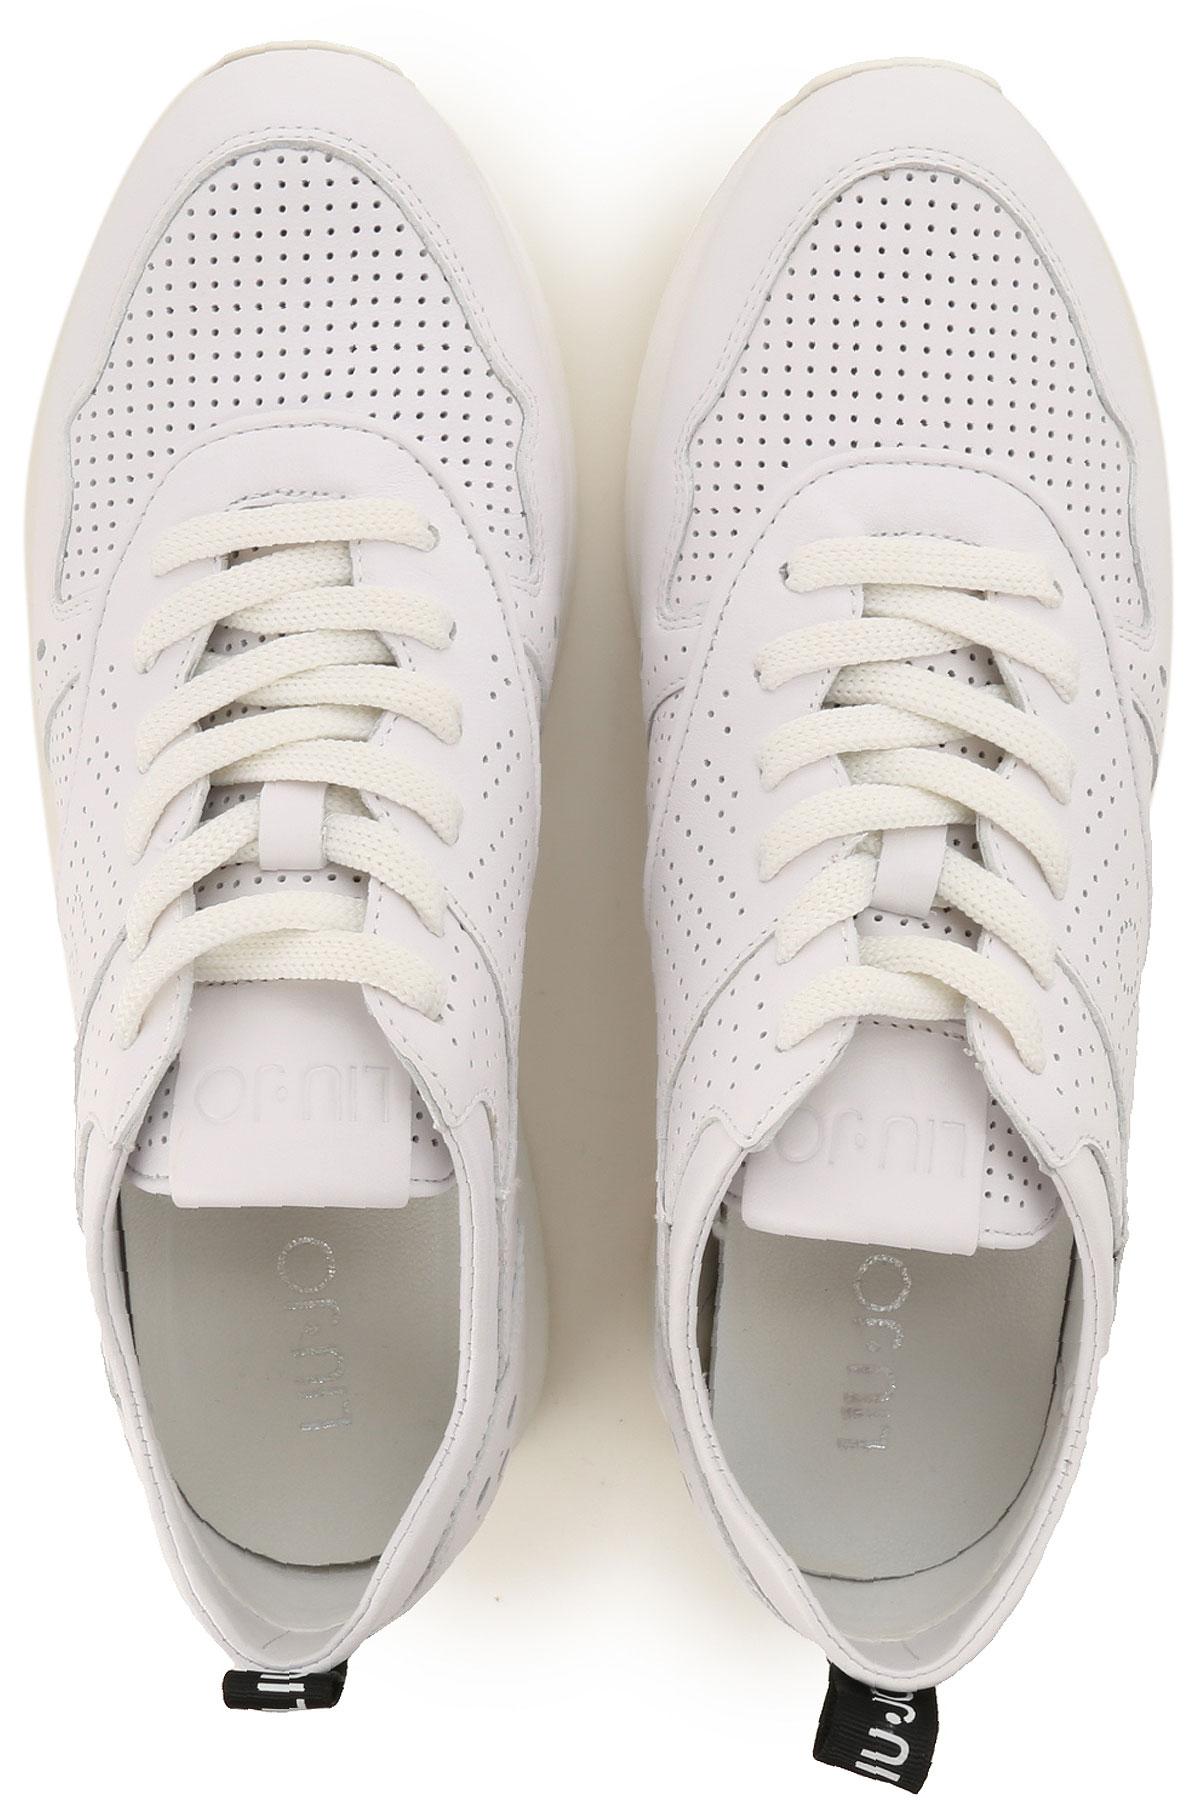 Blanco Mujer Primavera verano nbsp; Liu Para Jo Zapatos 2019 xtwqOa0Hn